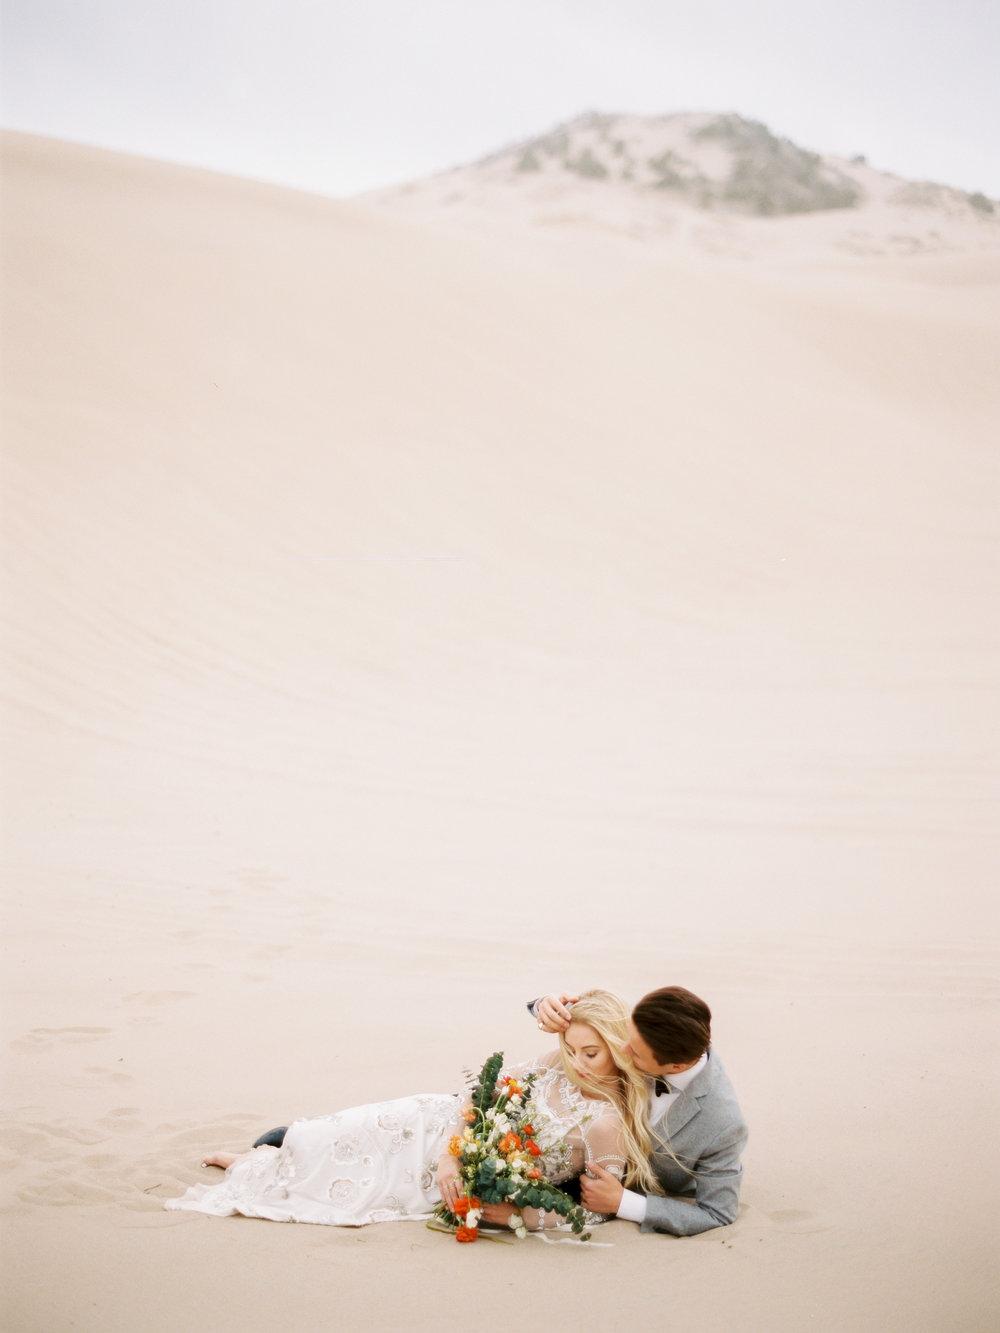 SandDunesBrittniWilliePhotography-21.jpg